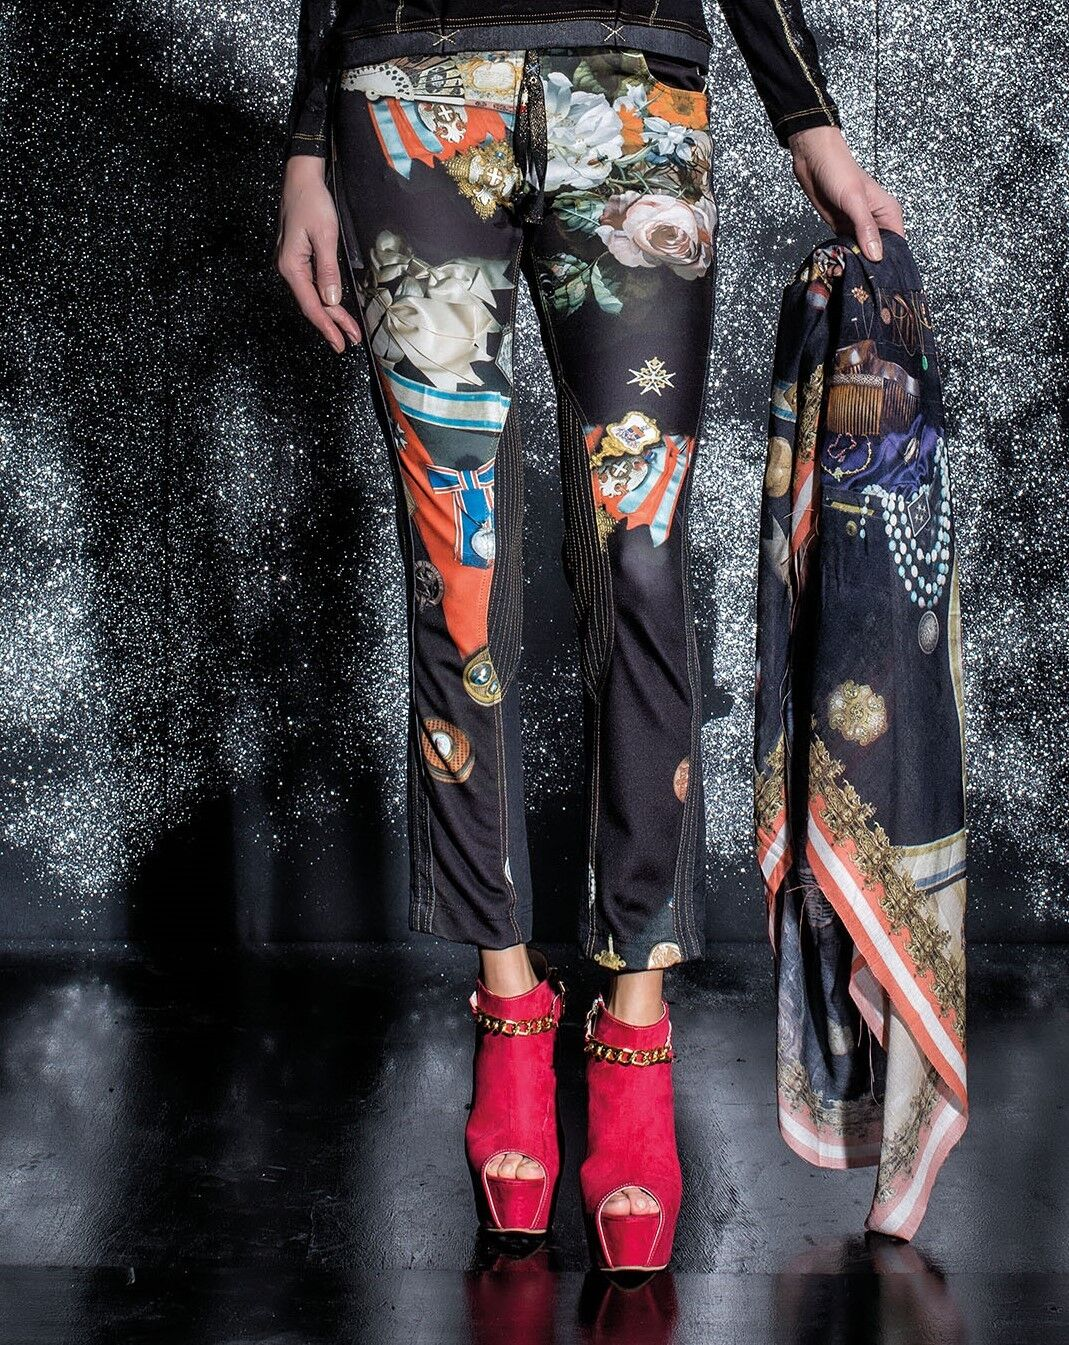 ELISA CAVALETTI Hose Jeans Trousers St. Stemmi Gr. 27, 28, 31 Koll. HW 16 17